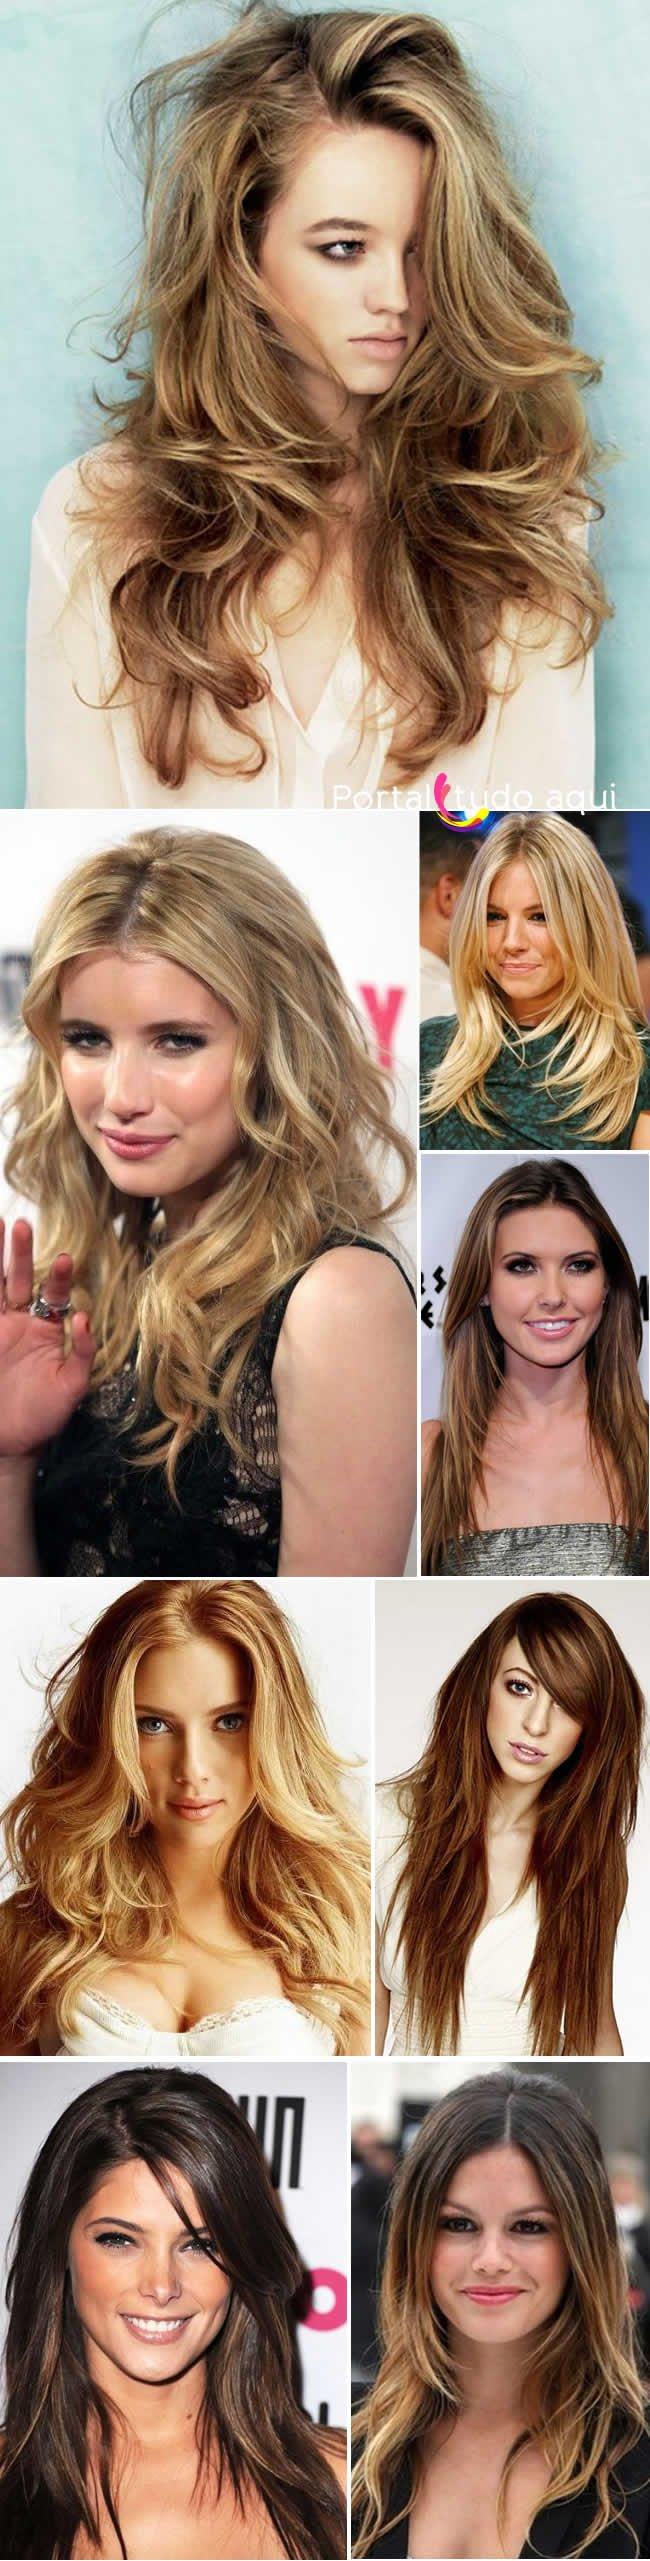 cabelo longo corte moderno 2014